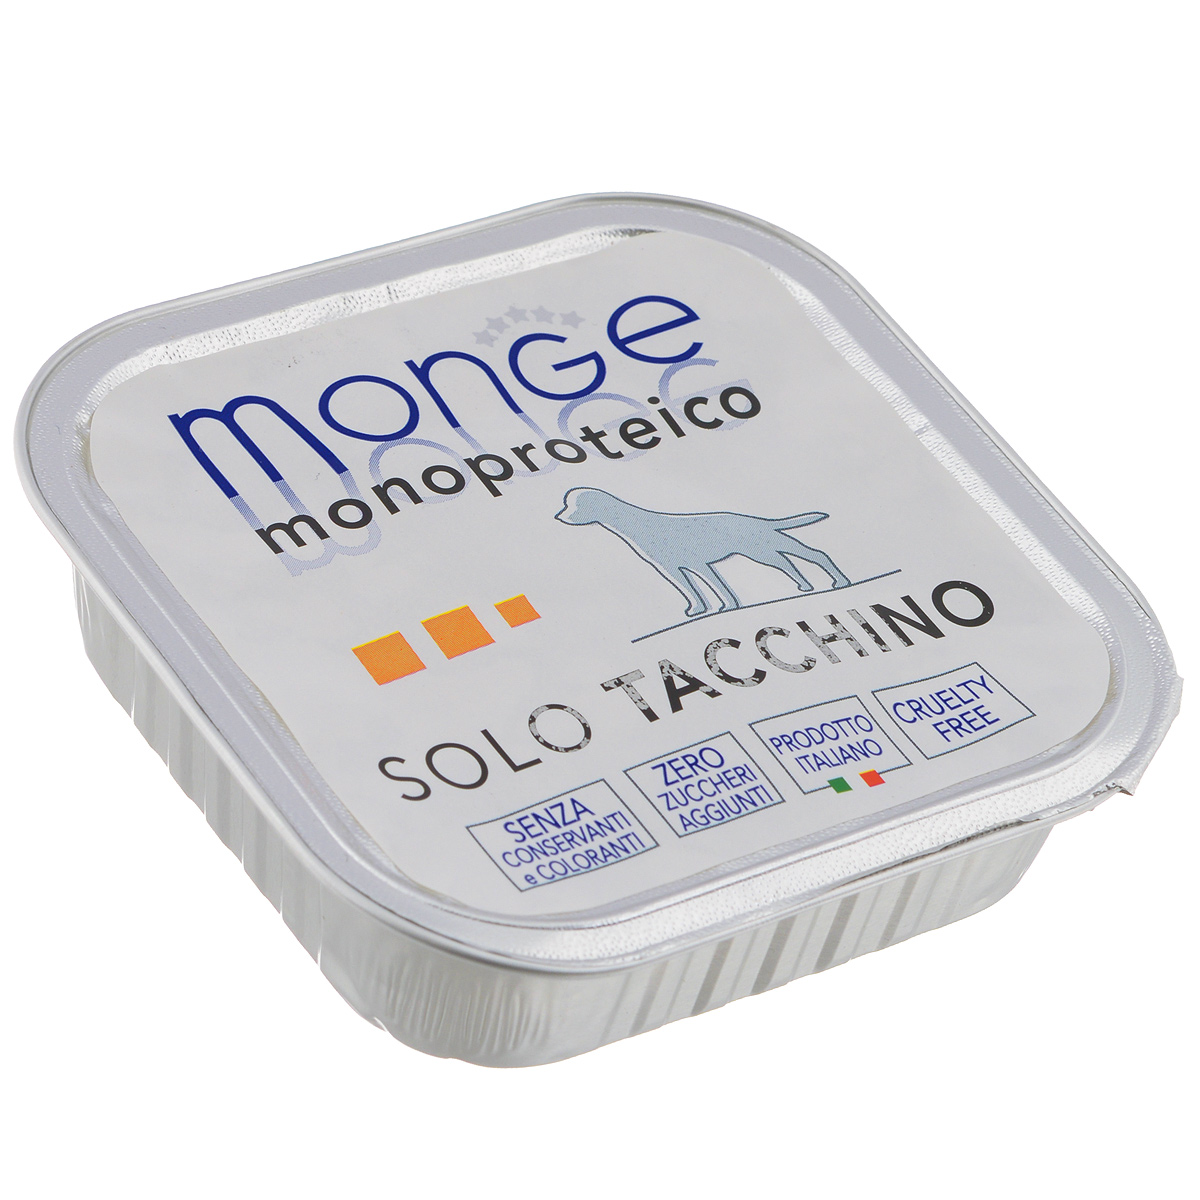 Консервы для собак Monge Monoproteico Solo, паштет из индейки, 150 г консервы для собак titbit raf паштет с кроликом 100 г